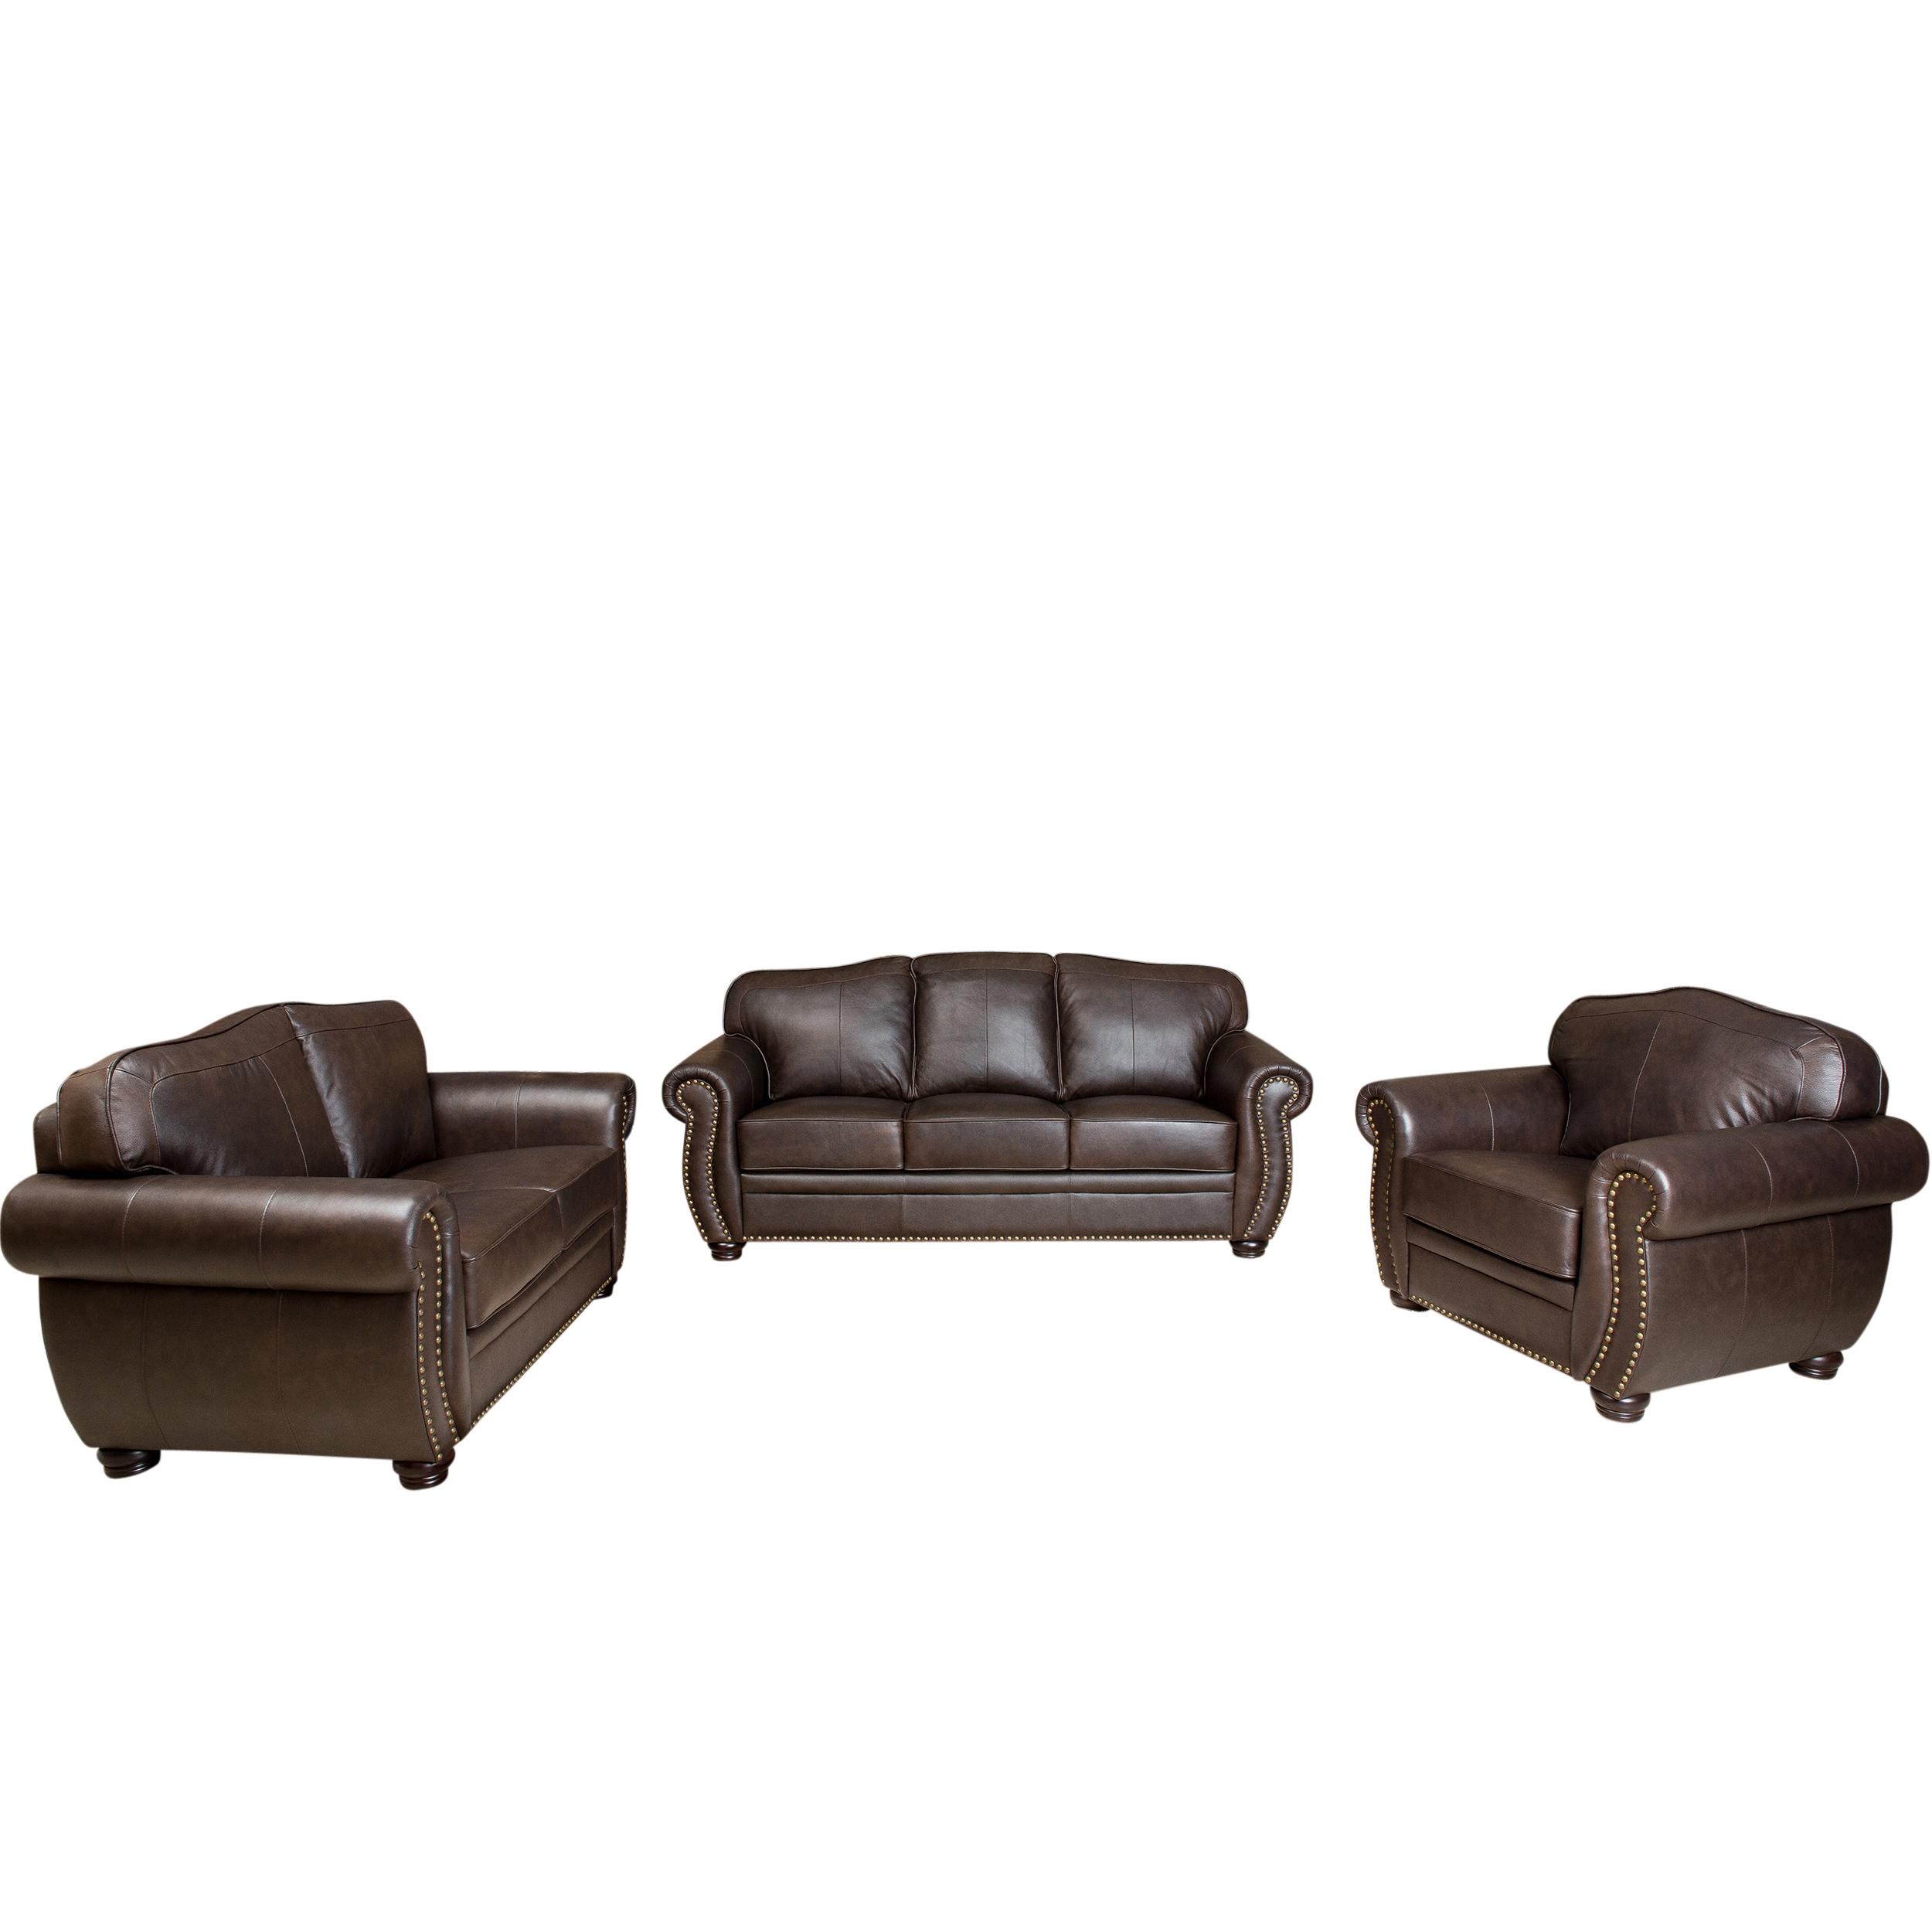 Shop Abbyson Richfield Top-grain Leather Living Room Sofa Set - On ...